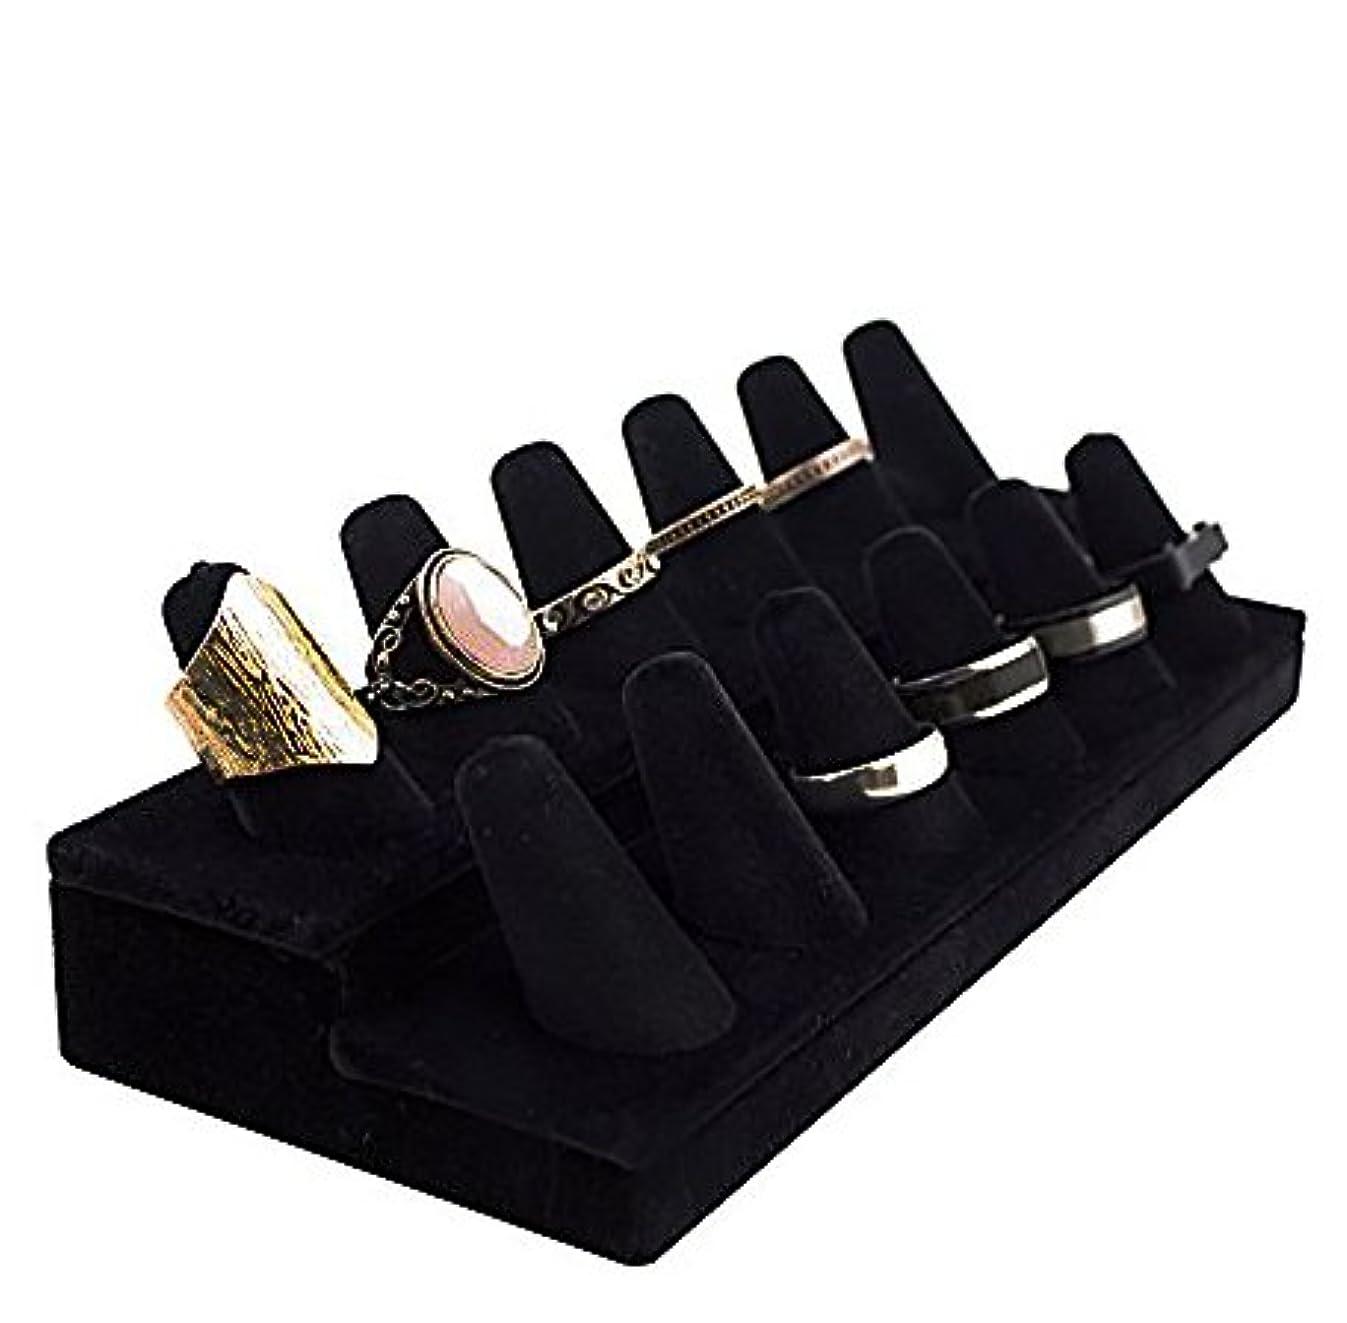 Adorox Black Velvet Finger Ring Showcase Display Jewelry Organizer Stand